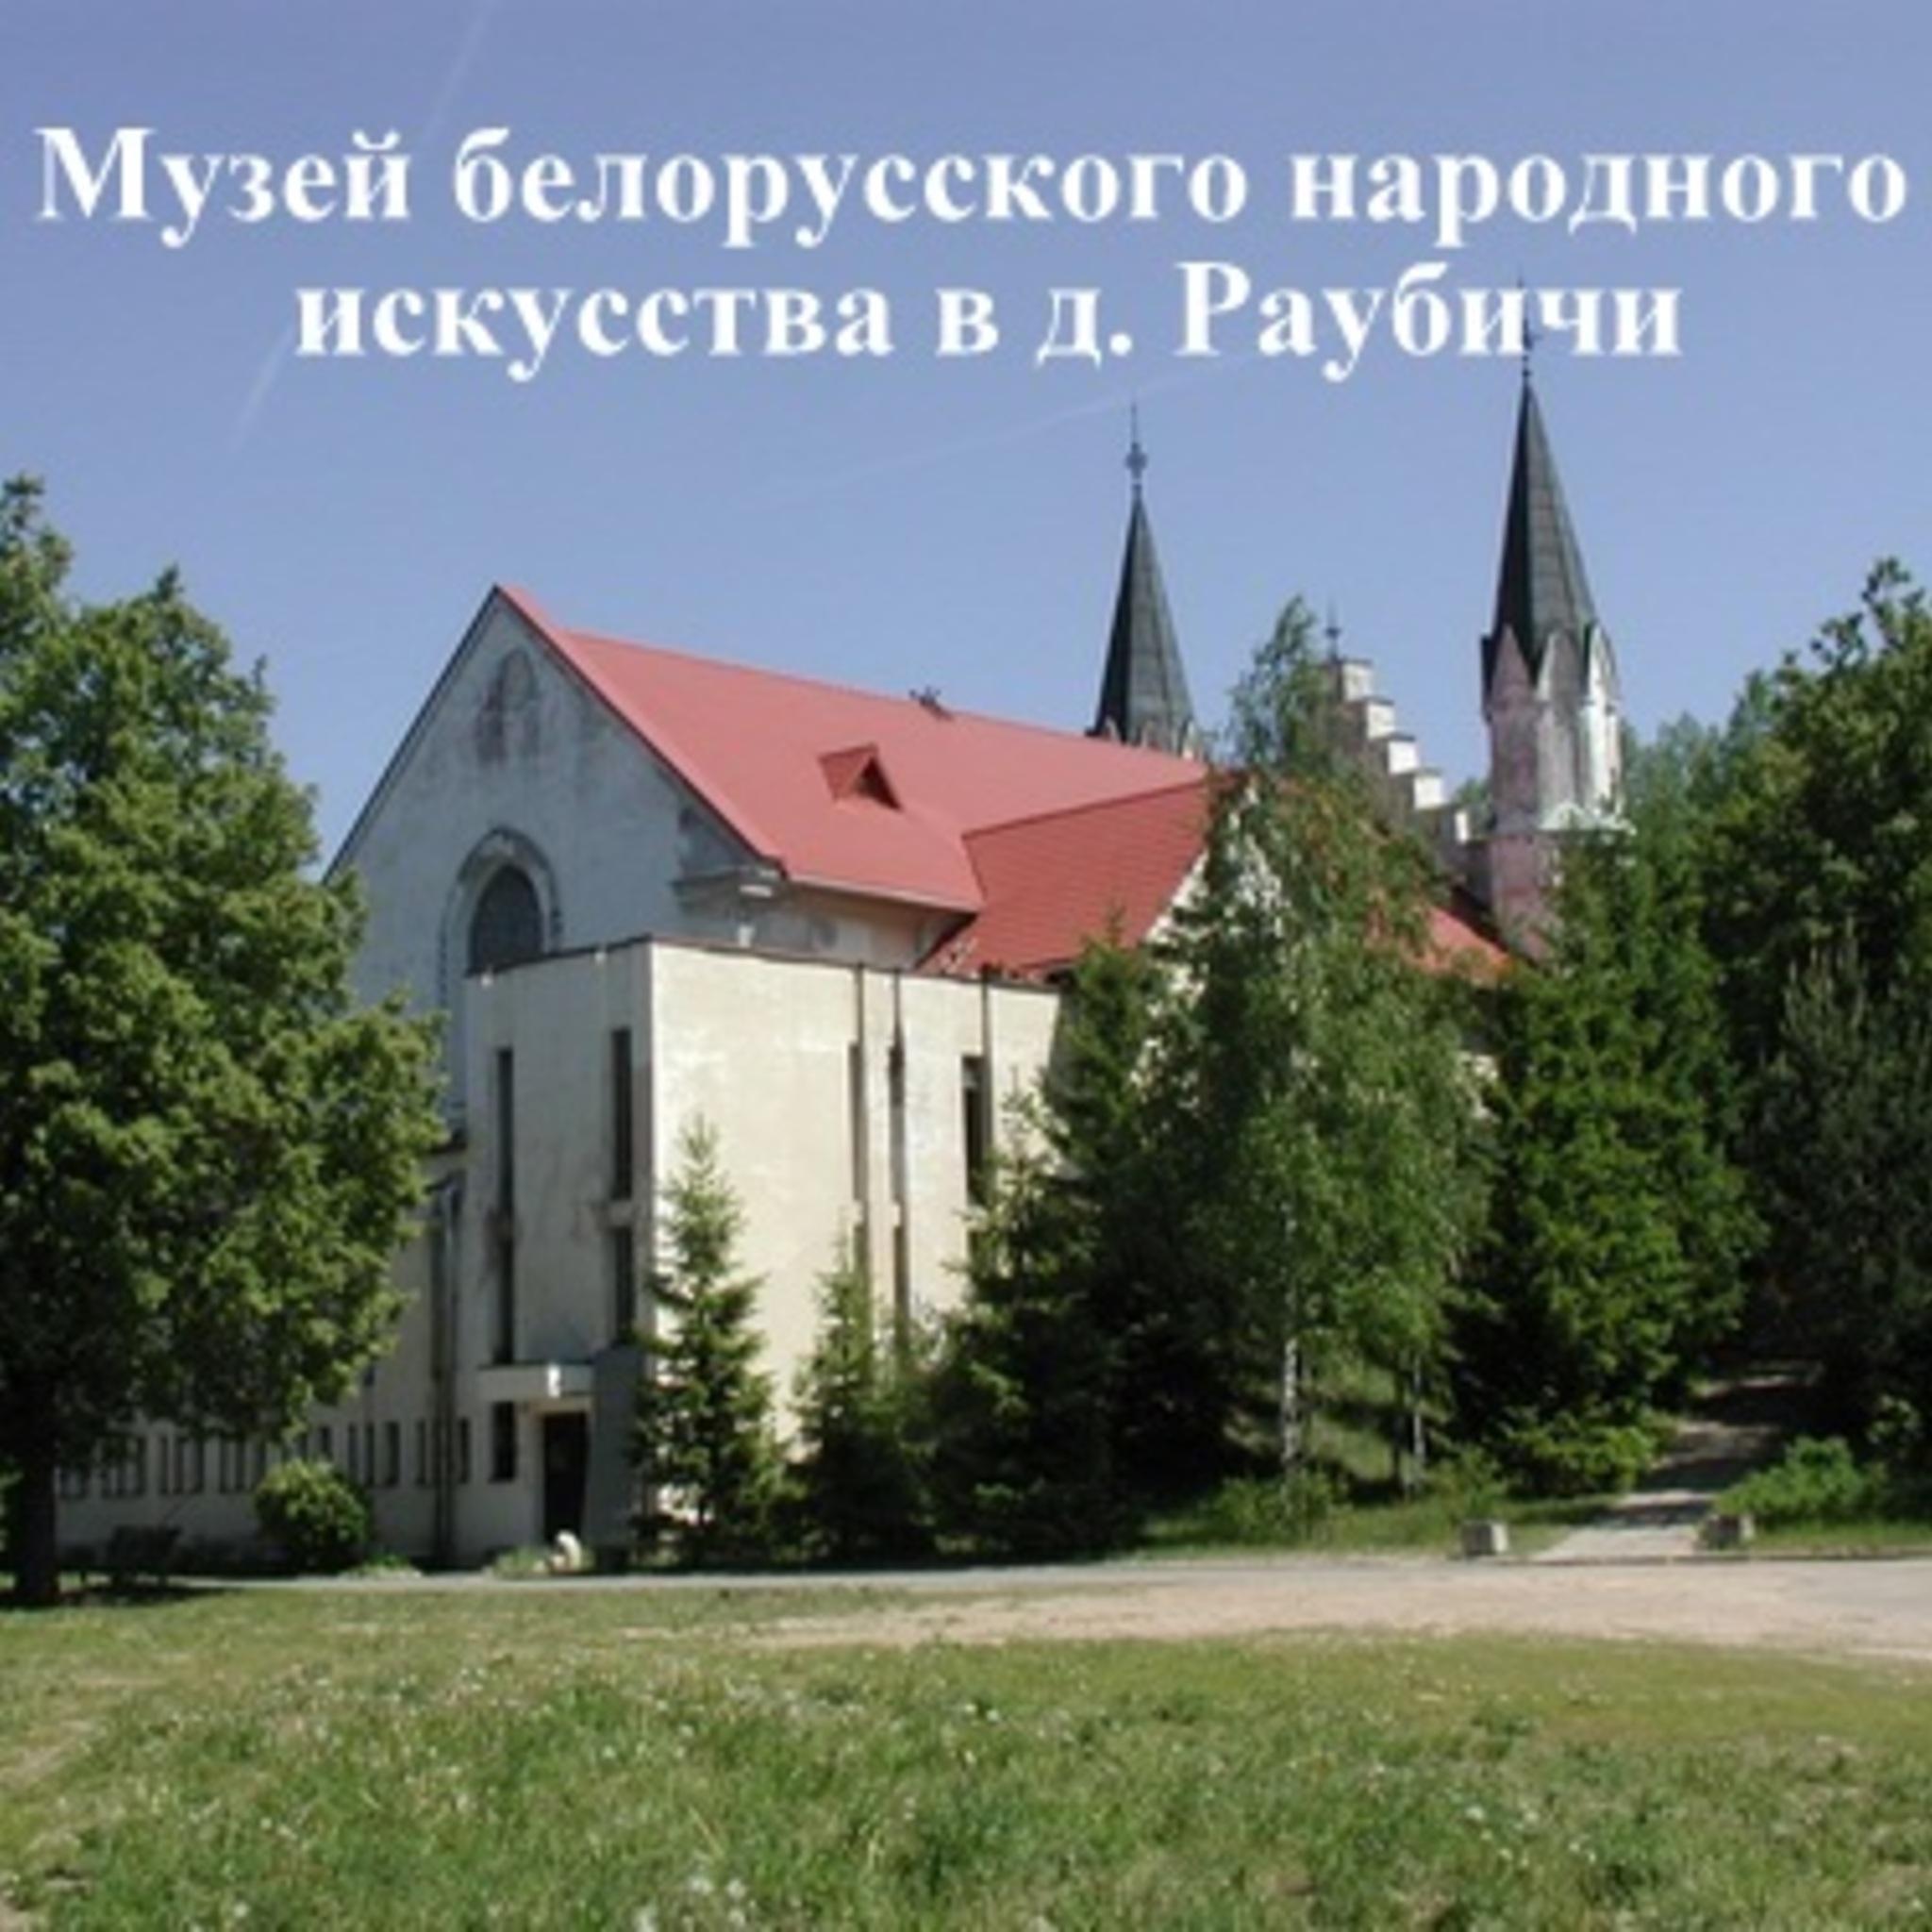 Belarusian Folk Art Museum in the village. Raubichi